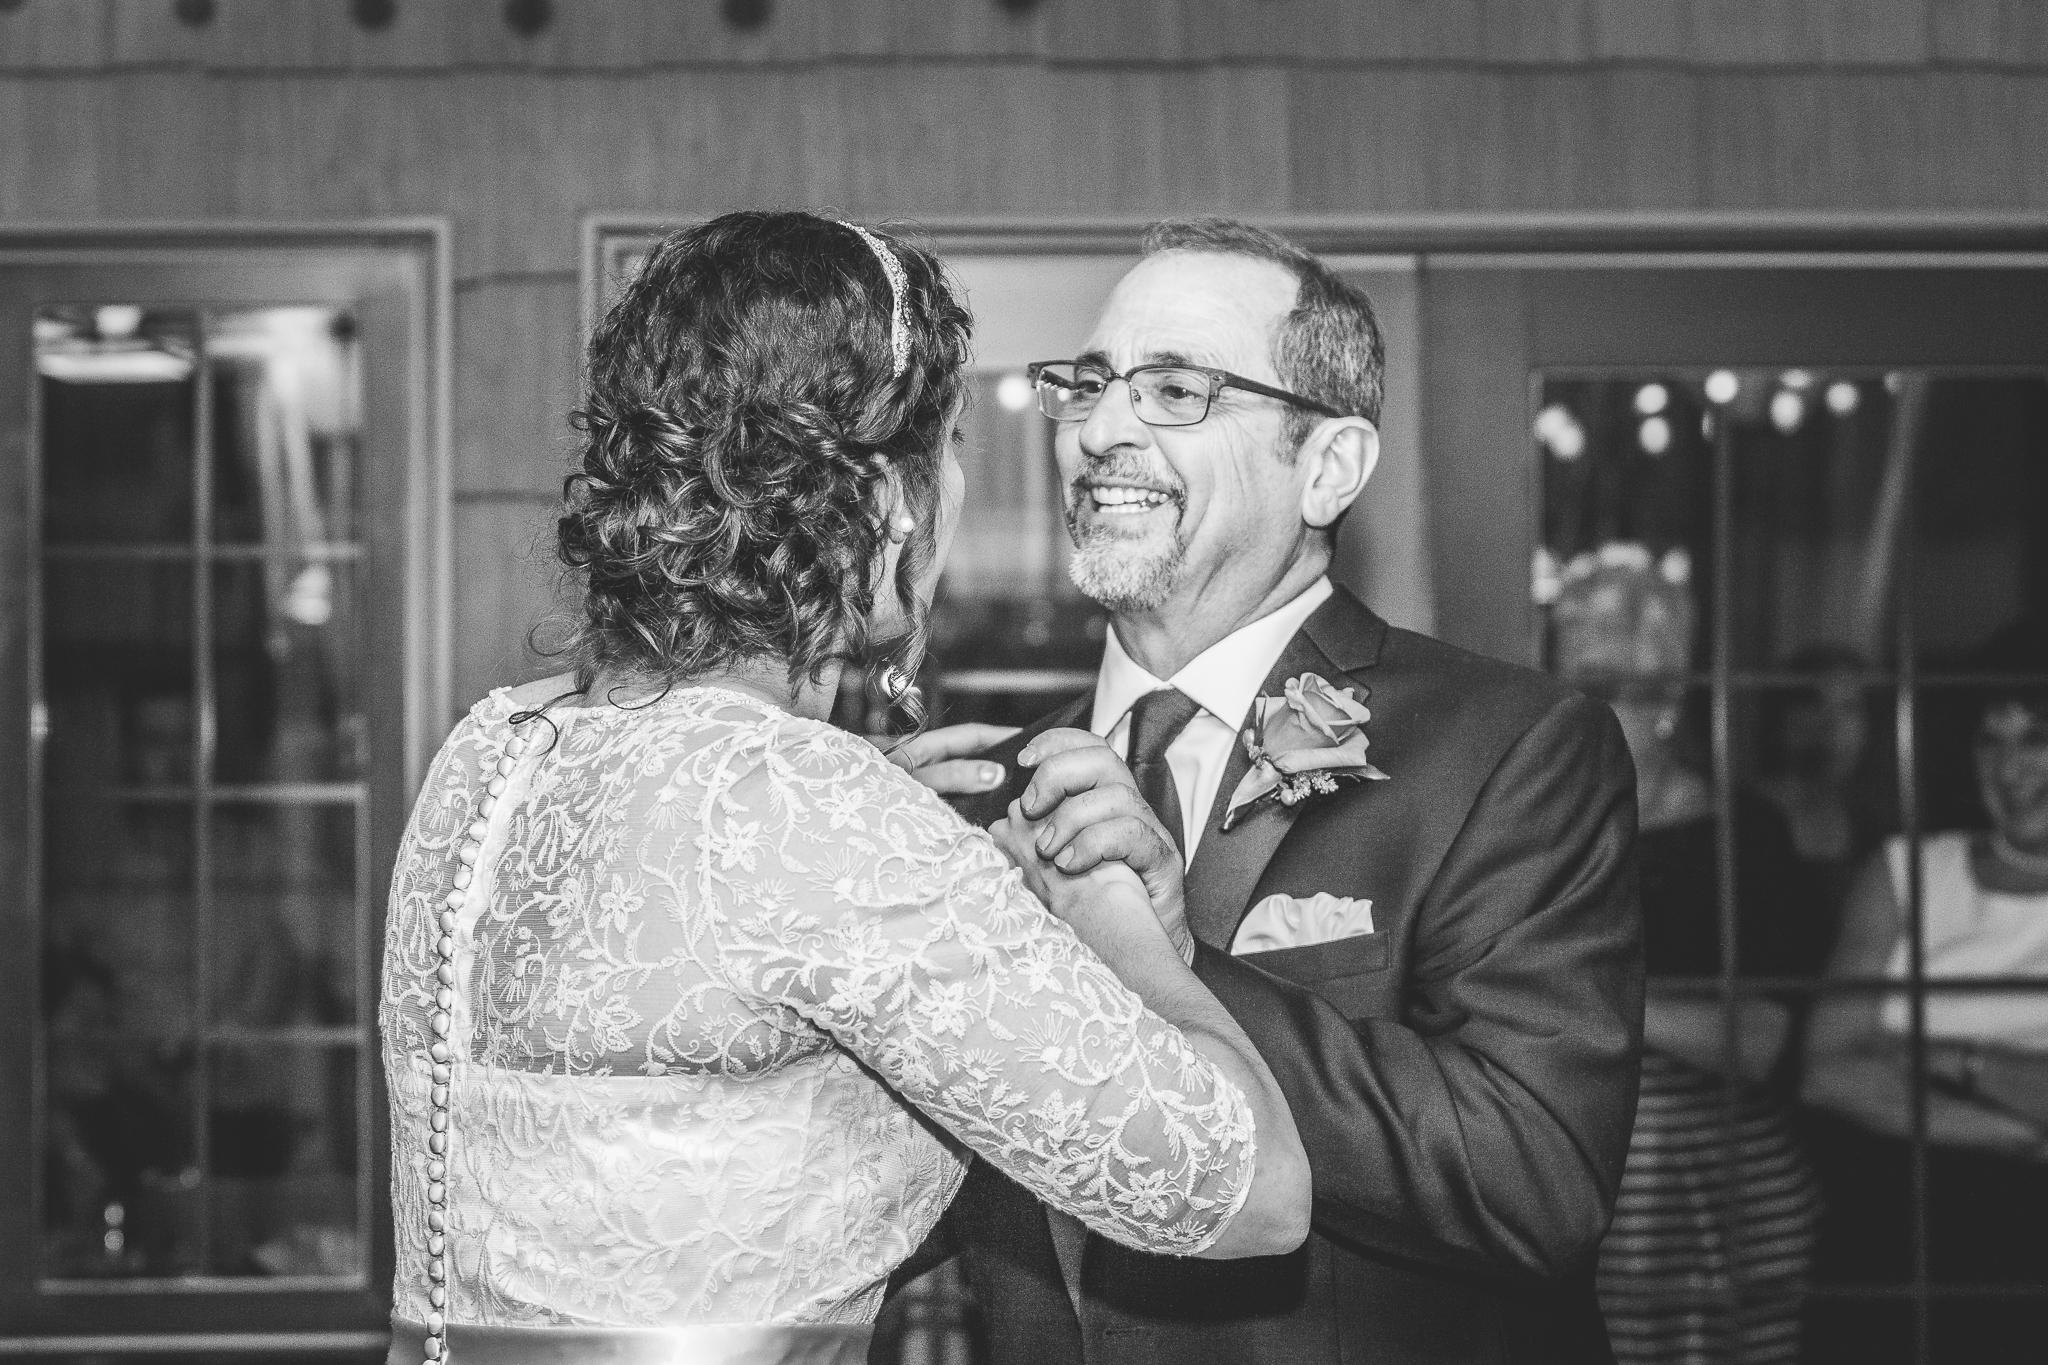 camuglia-whomstudio-chelsea_and_andy-nycphotographer-wedding-brooklyn-buffalo-timberlodge-124-0768.jpg